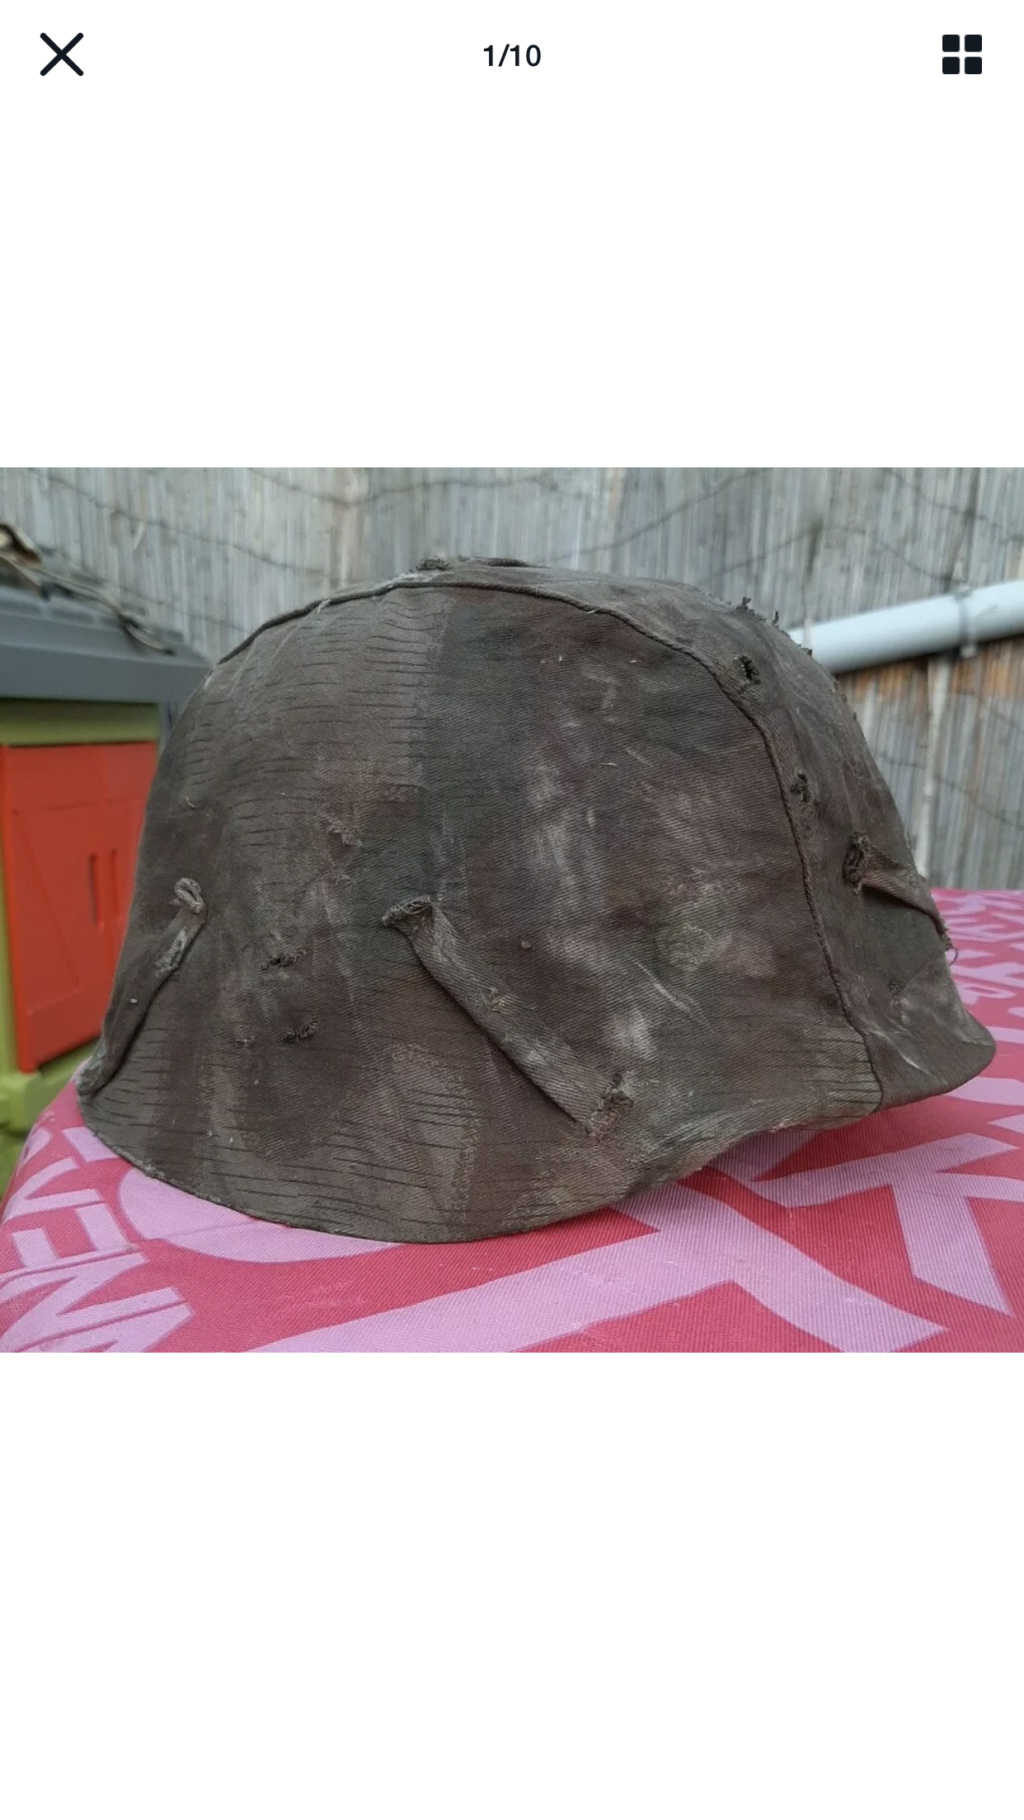 Couvre casque  A5559910